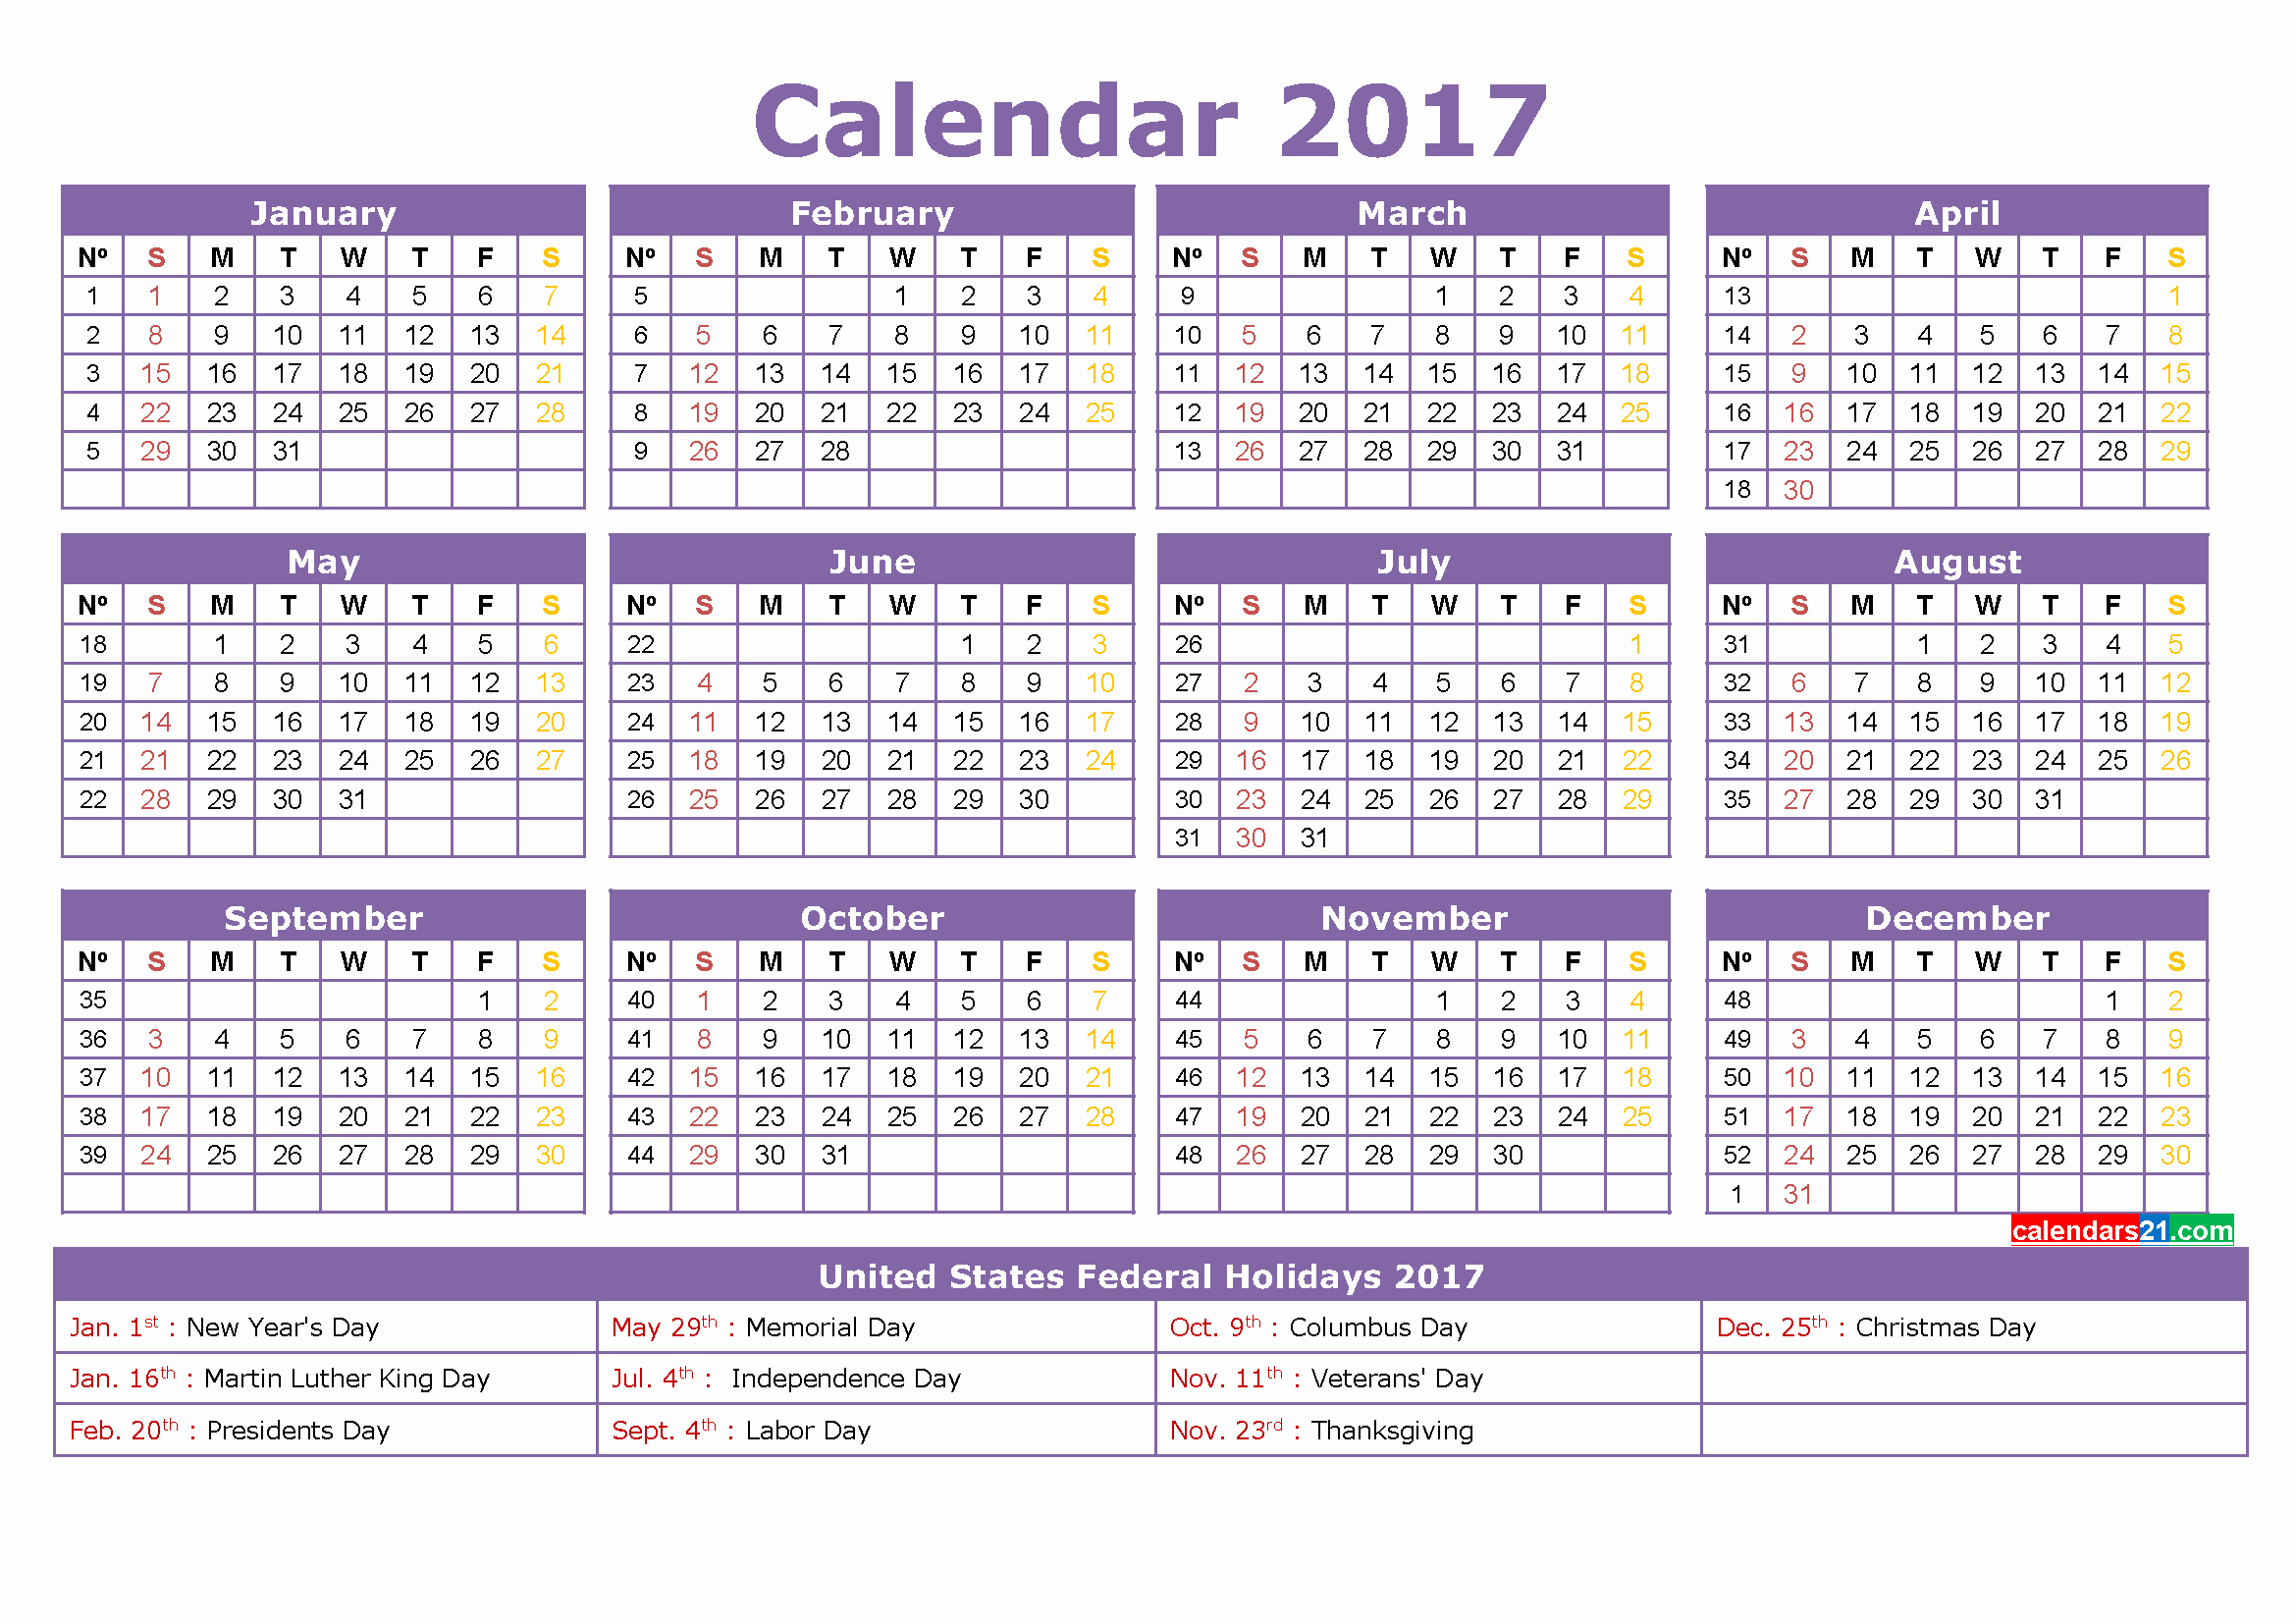 Calendar 2017 Template with Holidays Beautiful Calendar 2017 50 Important Calendar Templates Of 2017